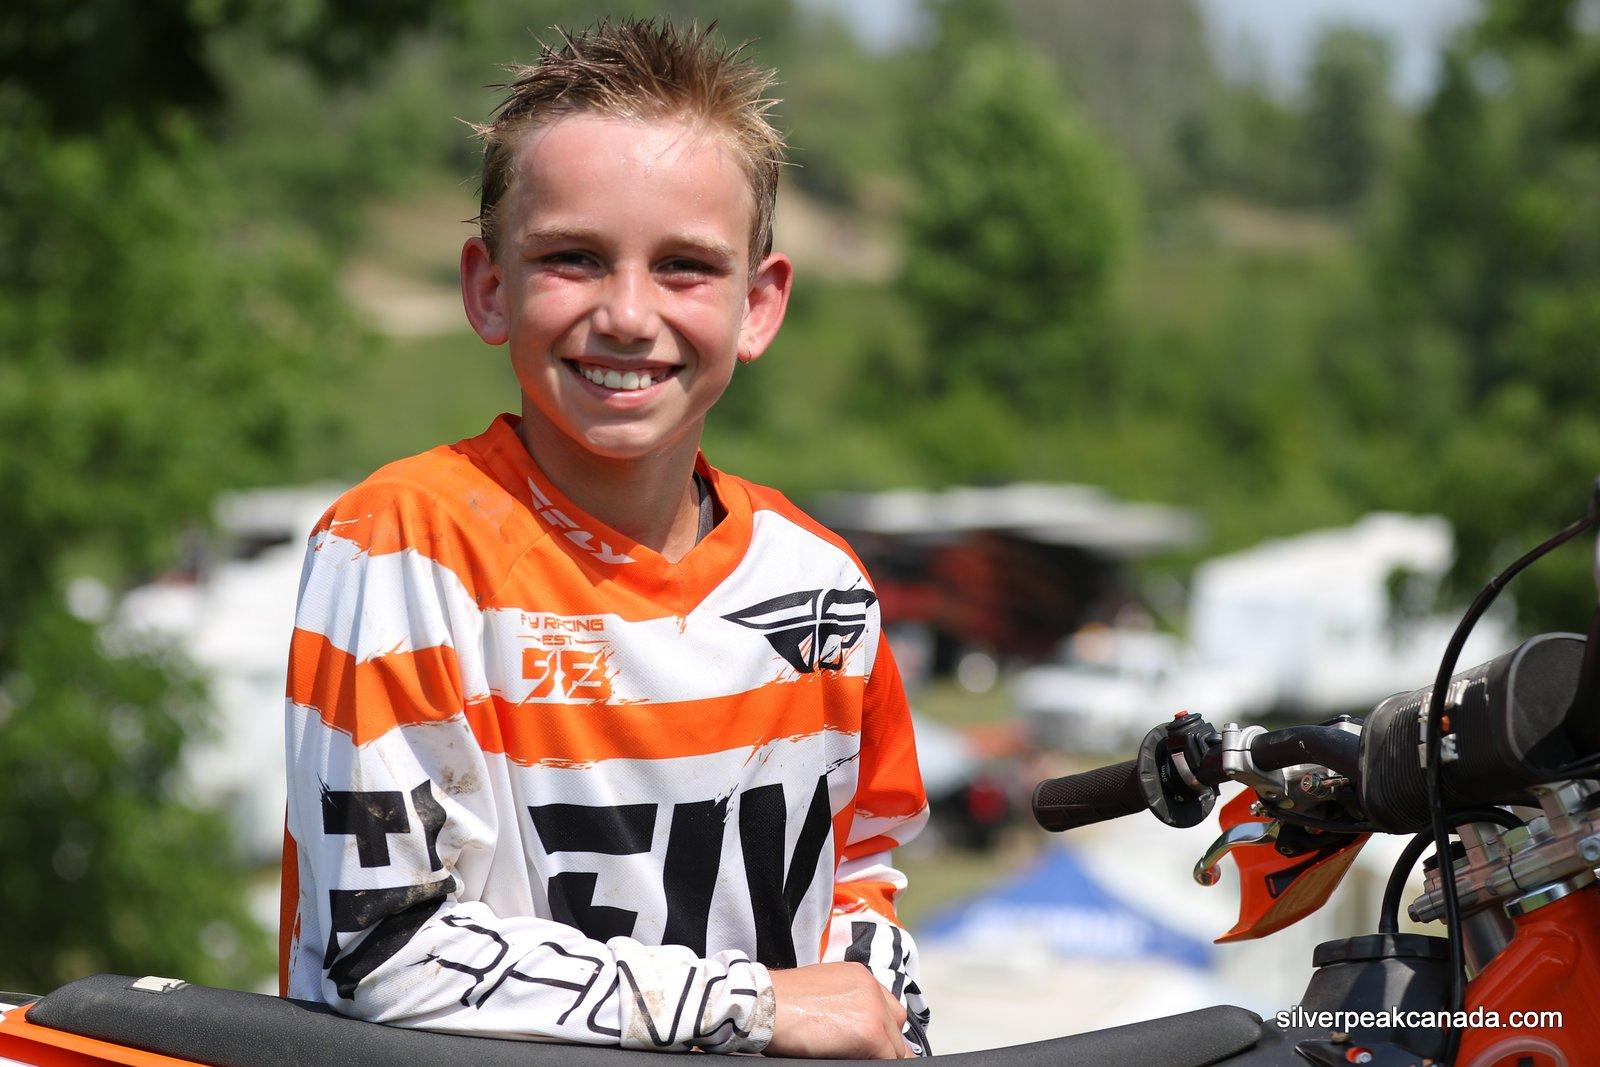 SilverPeak-Studios-Canada-Sarnia-Photography-Motocross-Gully-Mor-Moto-Alvinston-Cole-Pranger (3)